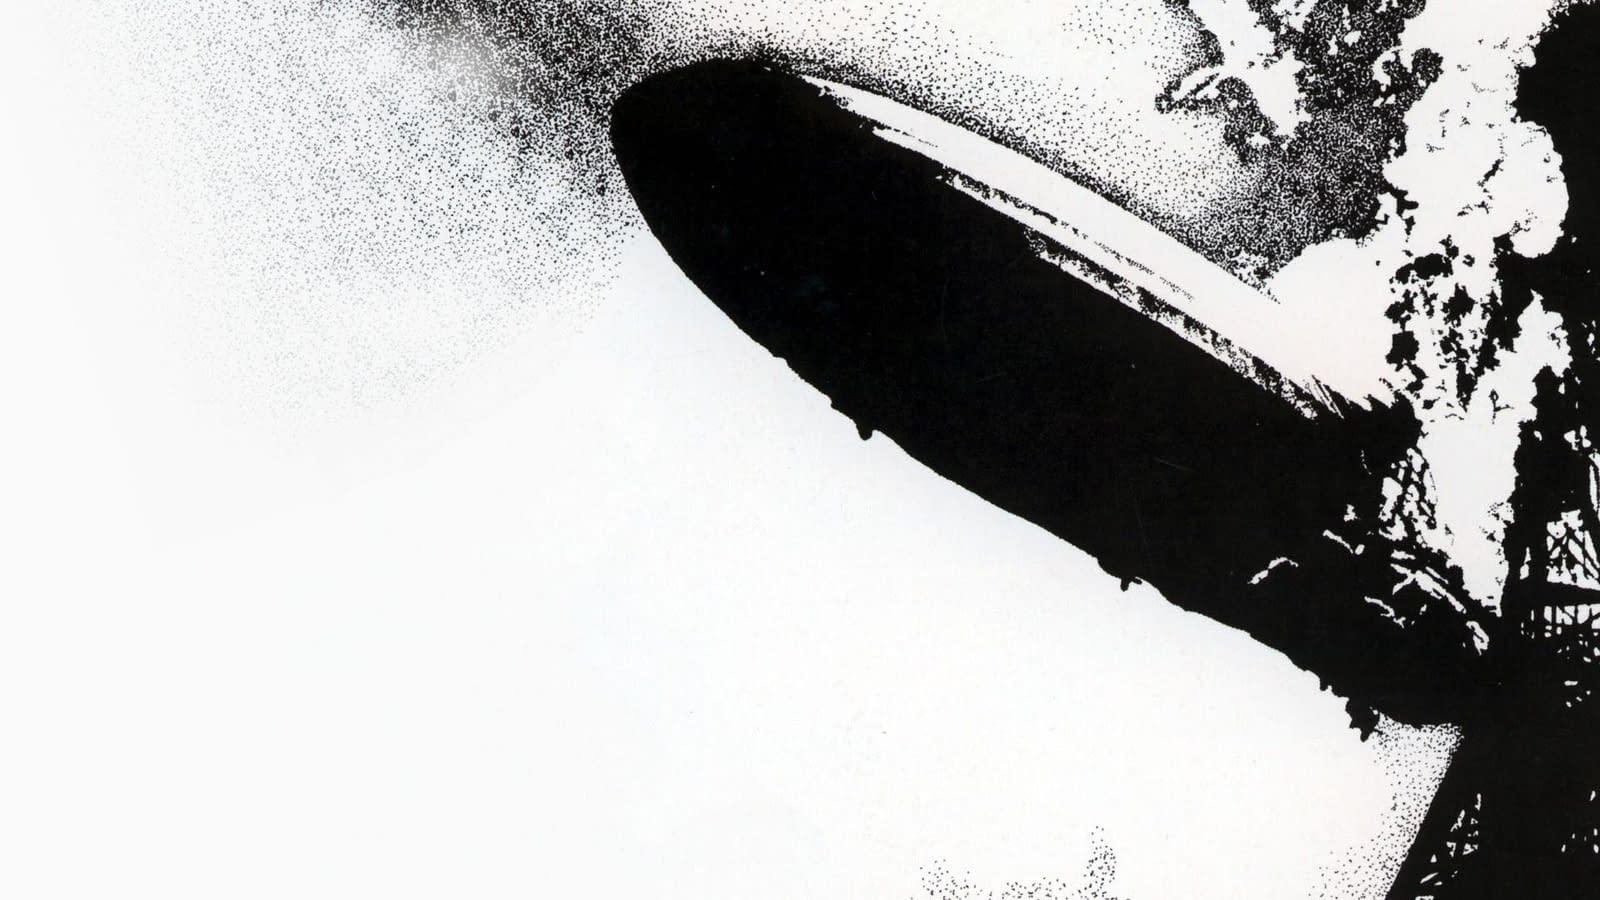 LED ZEPPELIN – Veneno anti-monotonia